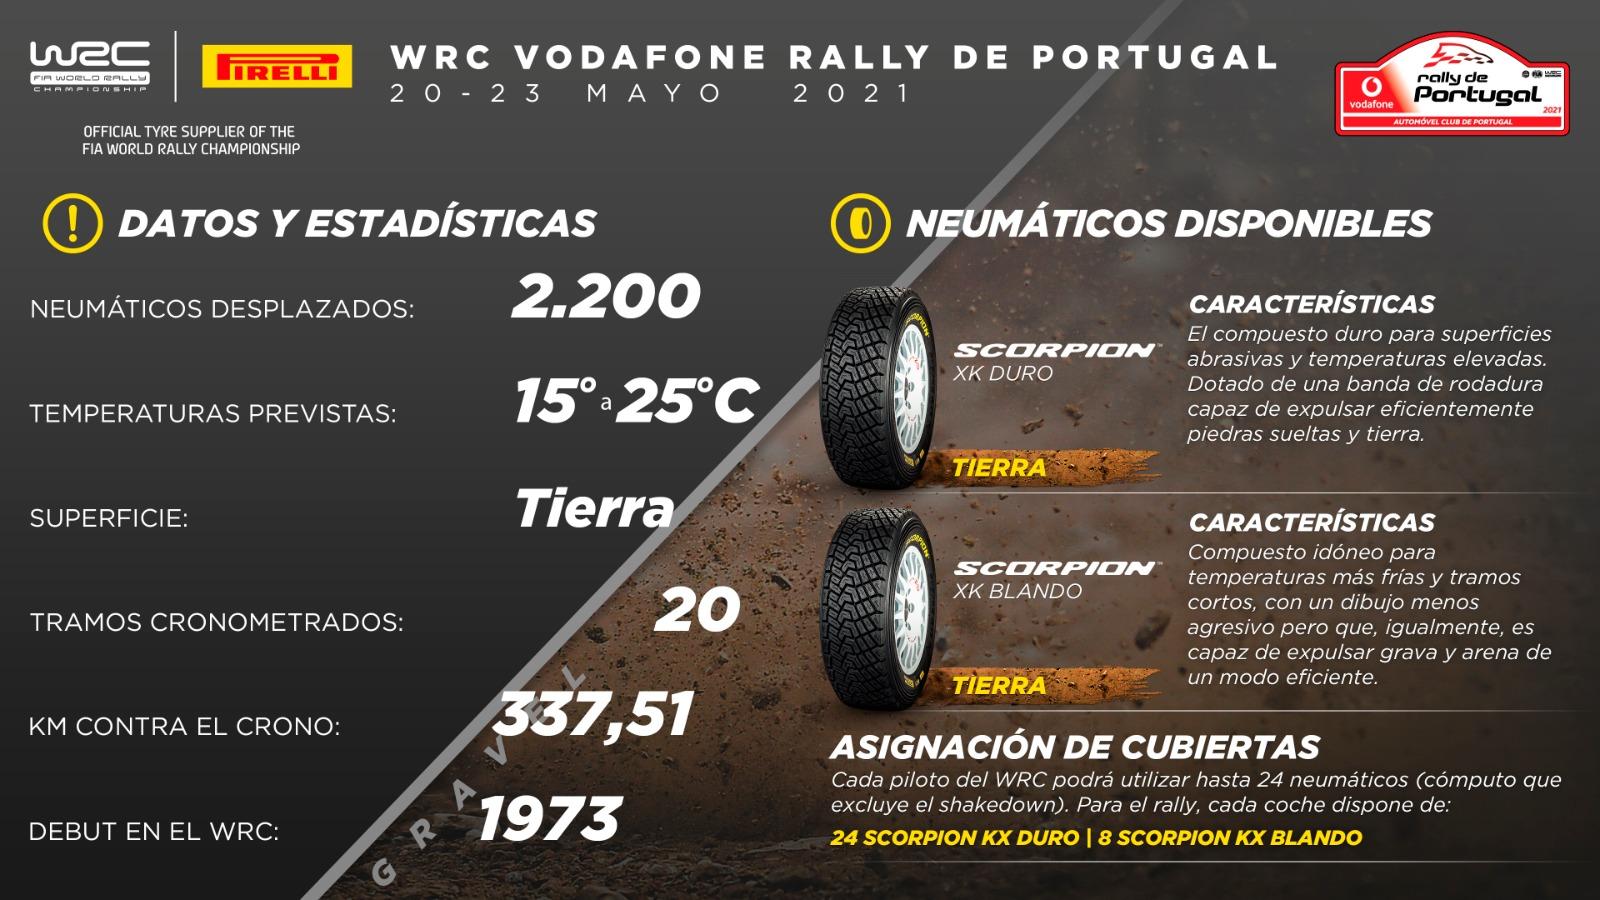 WRC: 54º Vodafone Rallye de Portugal [20-23 de Mayo] - Página 2 E1qcHAfWEAIgqqb?format=jpg&name=large